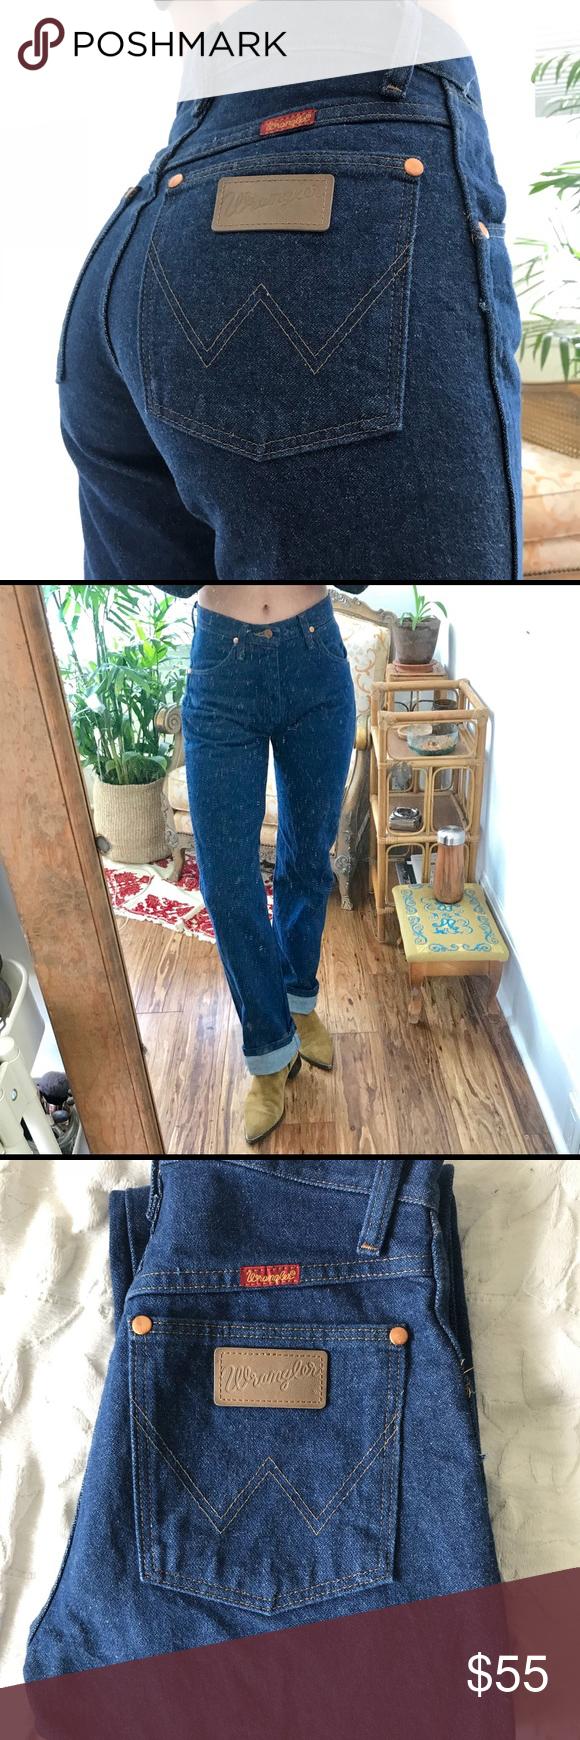 bebf43d7 Vintage WRANGLERS, Cowboy Fit Amazing Vintage condition 100% cotton rigid  denim High waist Modern